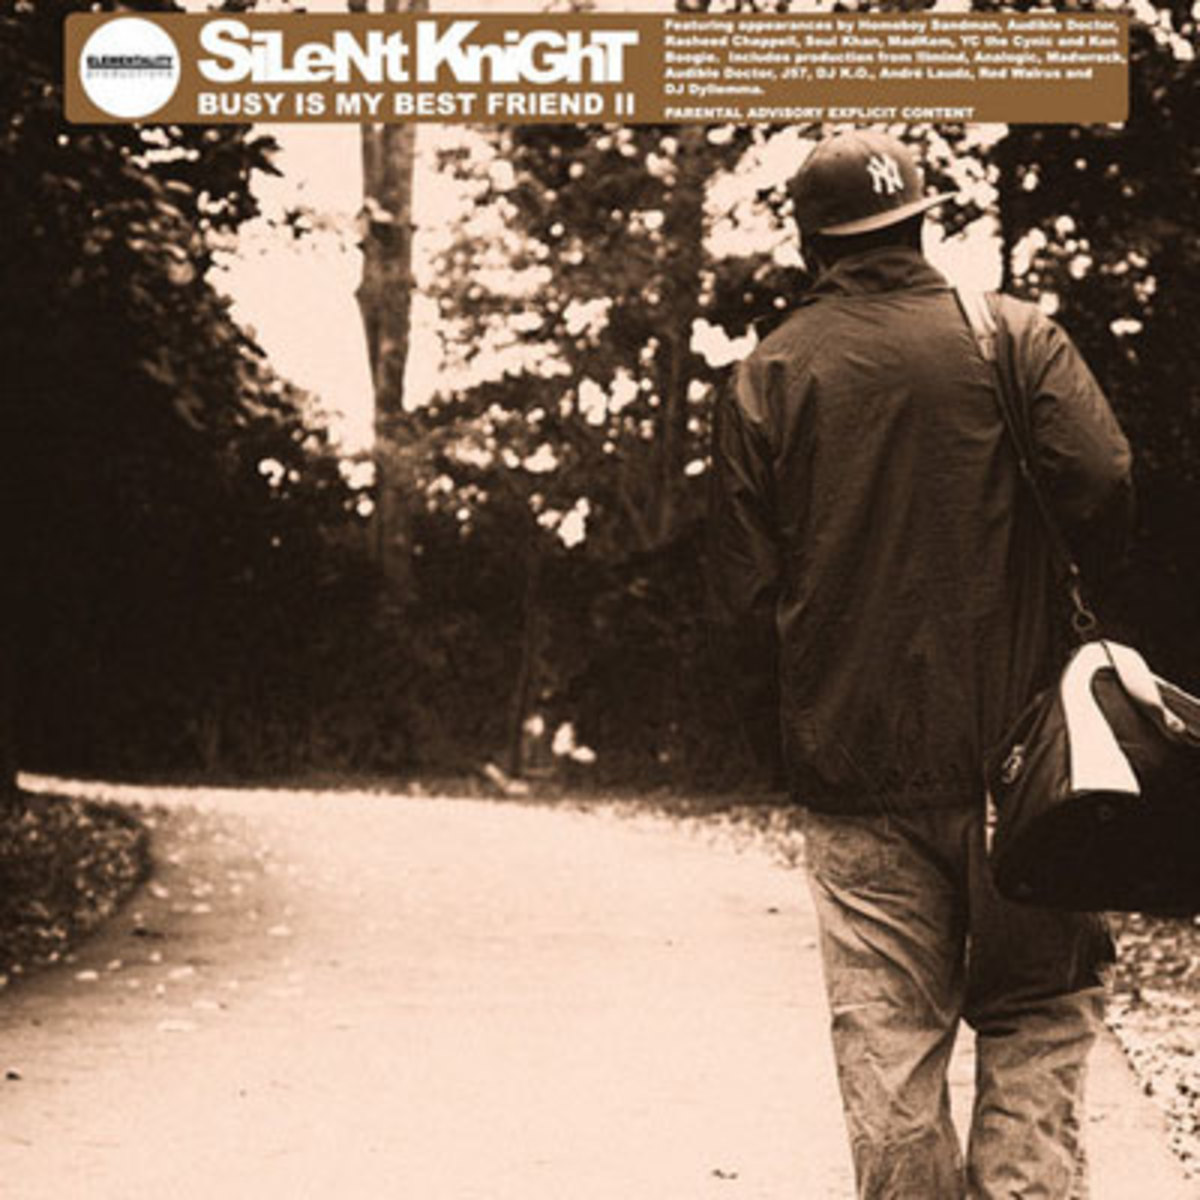 silentknight-busybest.jpg